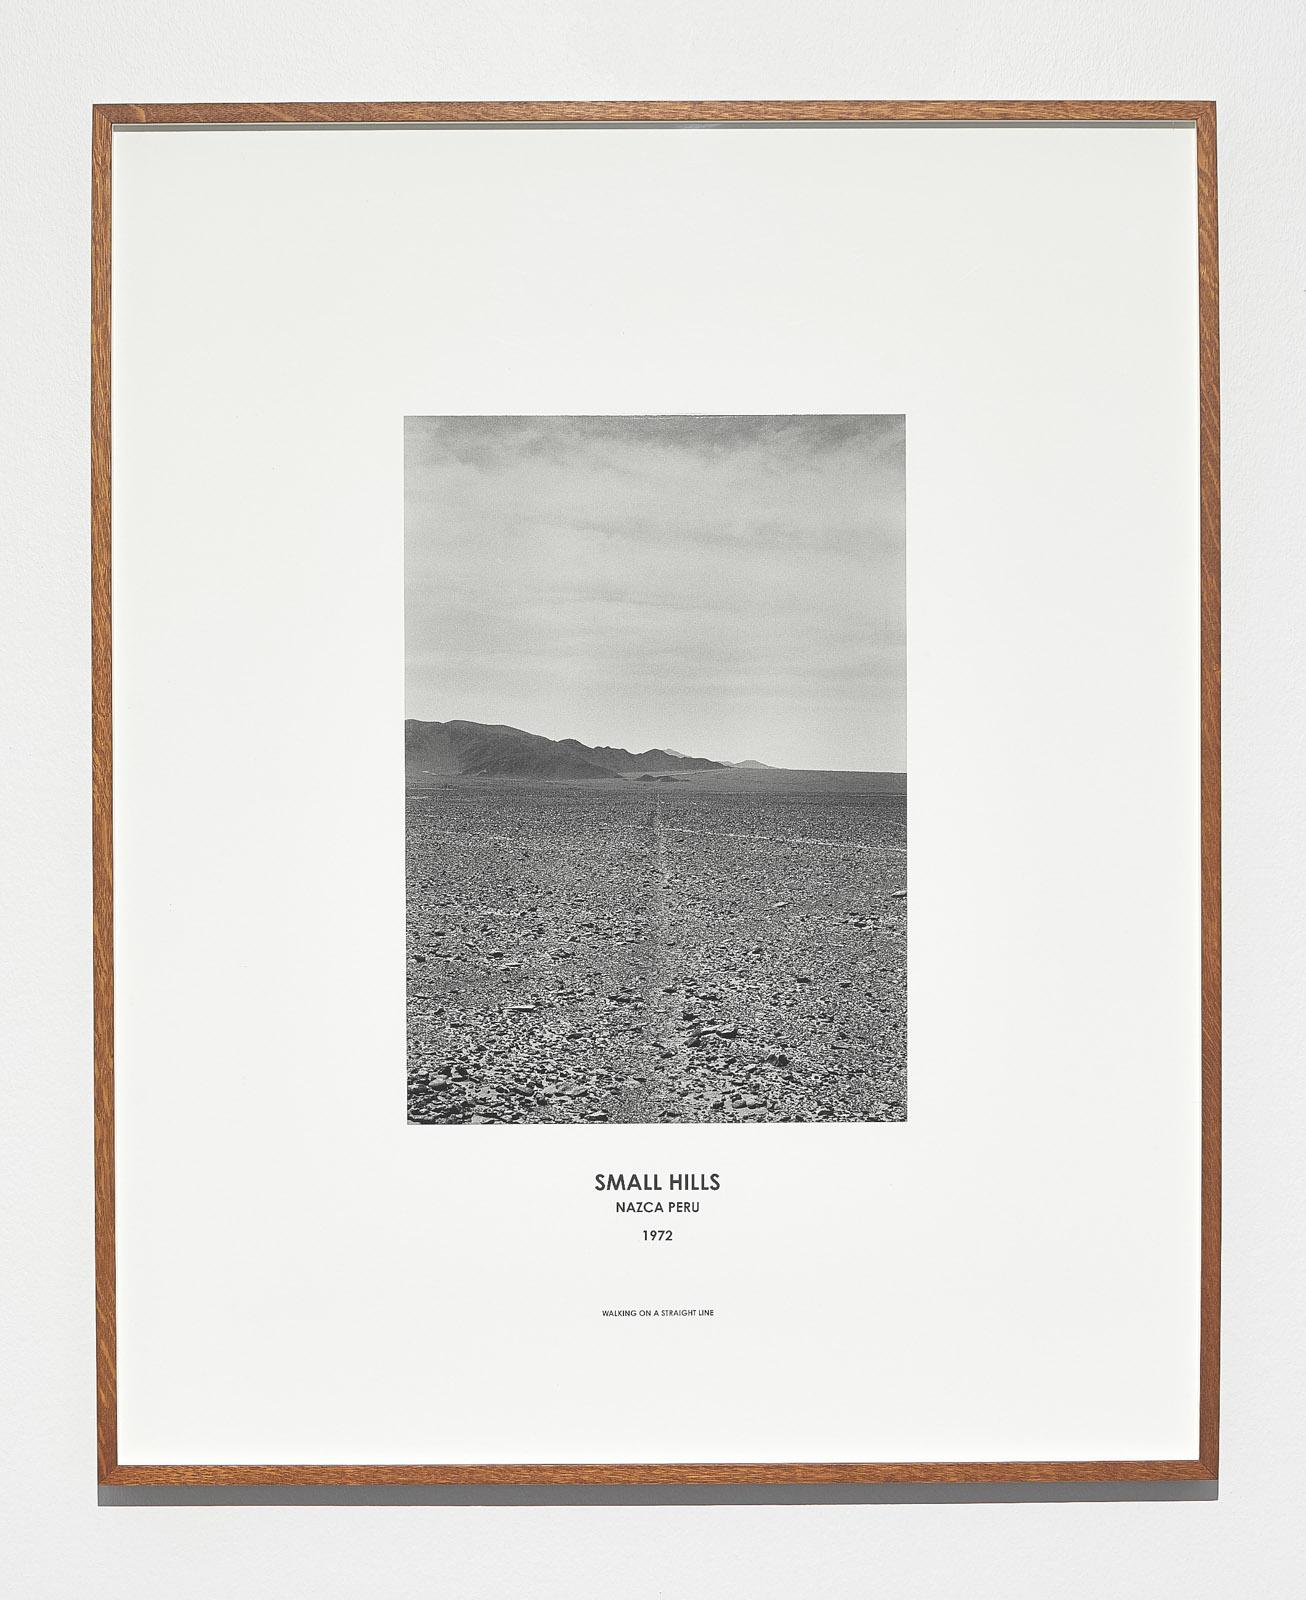 Hamish Fulton, Small Hills, Peru 1972, 1972, Silver gelatin print and digital text in artists frame, 87 x 71 x 4 cm, Unique